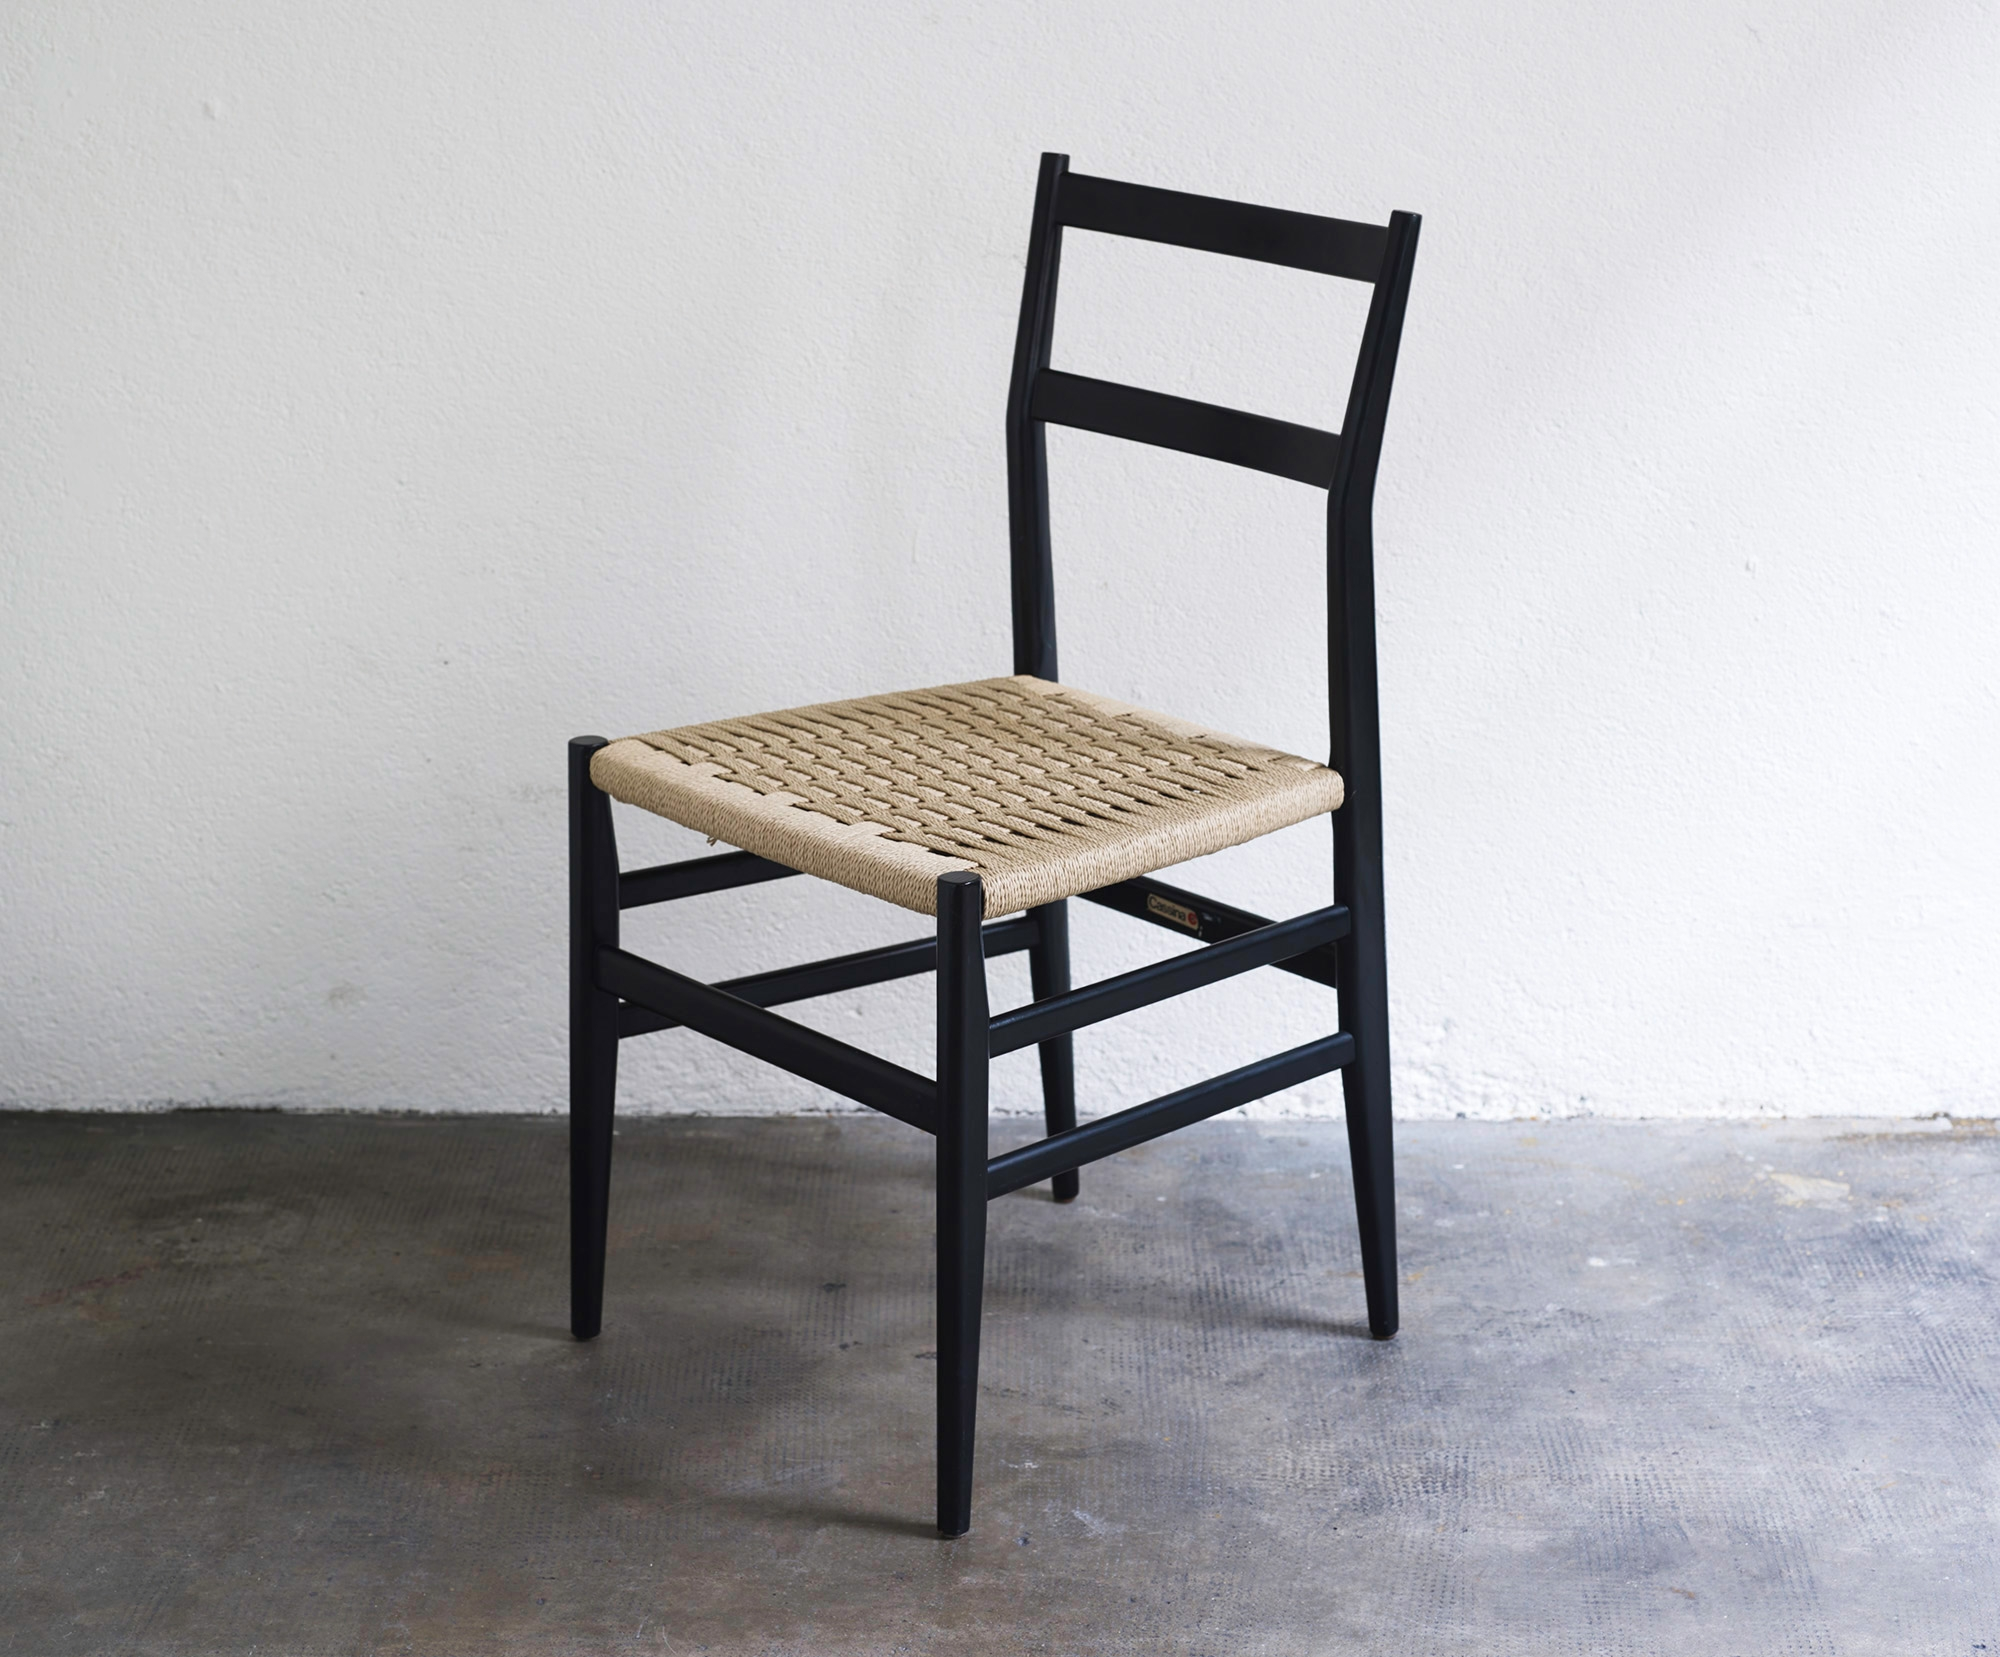 gio-ponti-leggera-chairs-image-01